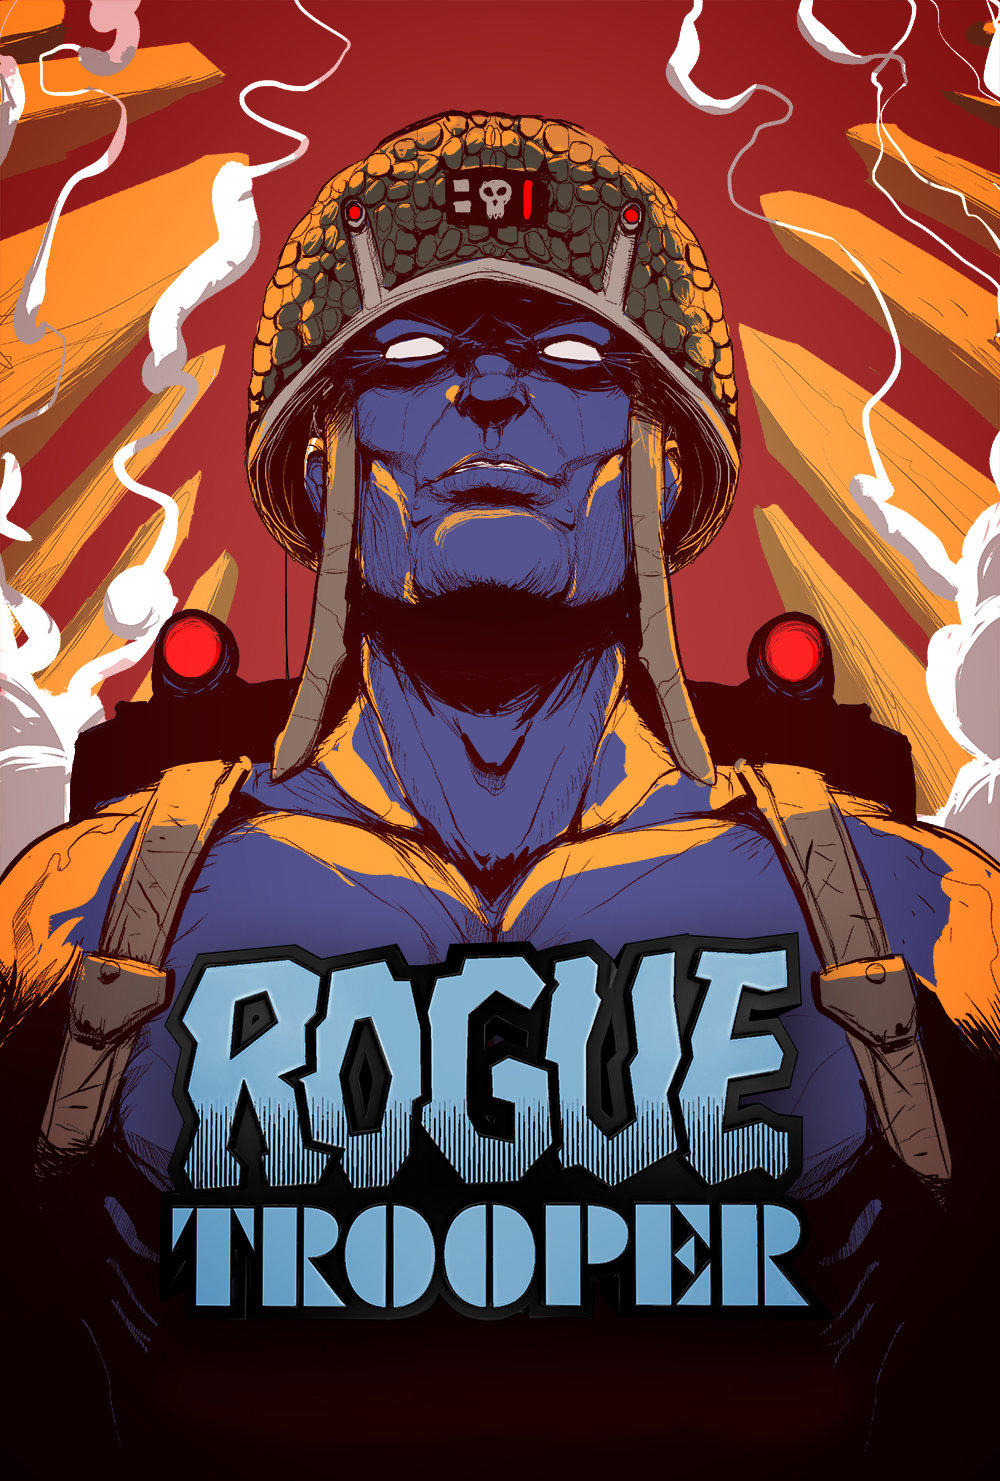 Rogue Trooper poster